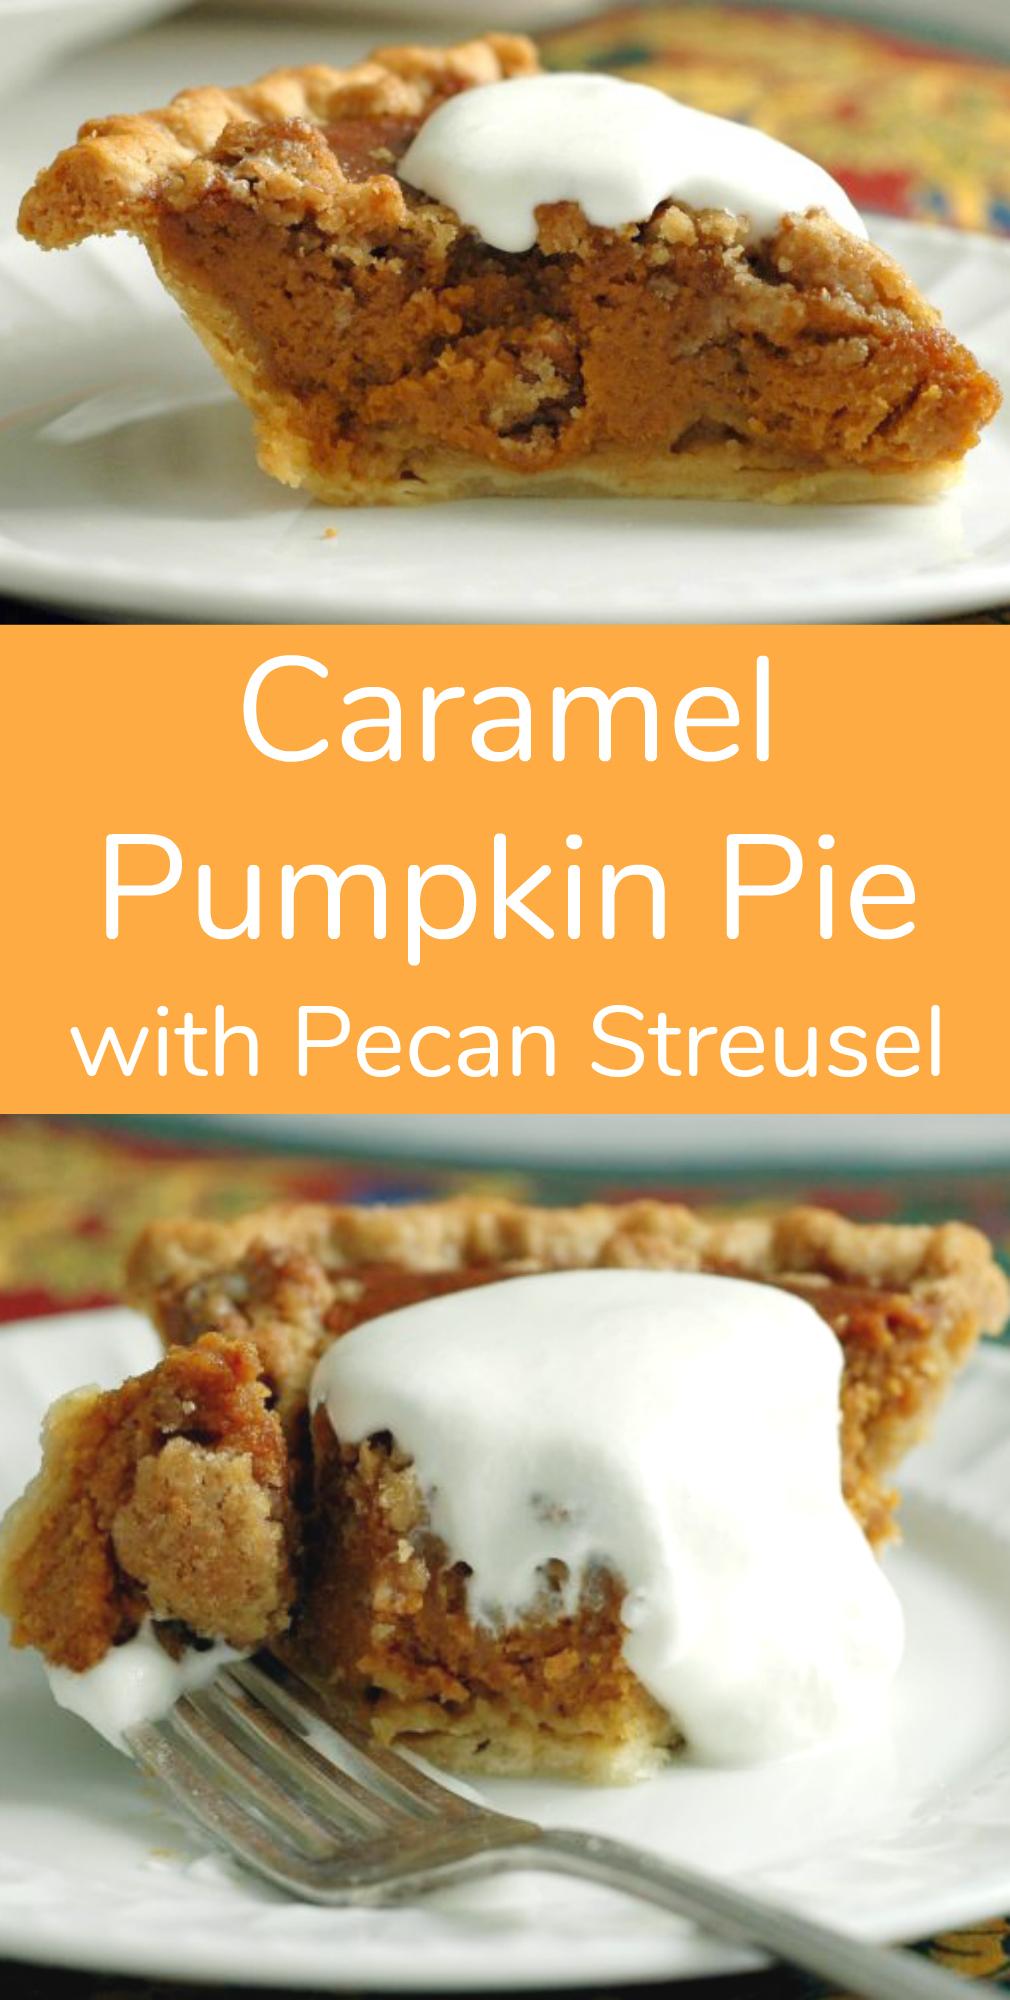 Caramel Pumpkin Pie with Pecan Streusel YUM